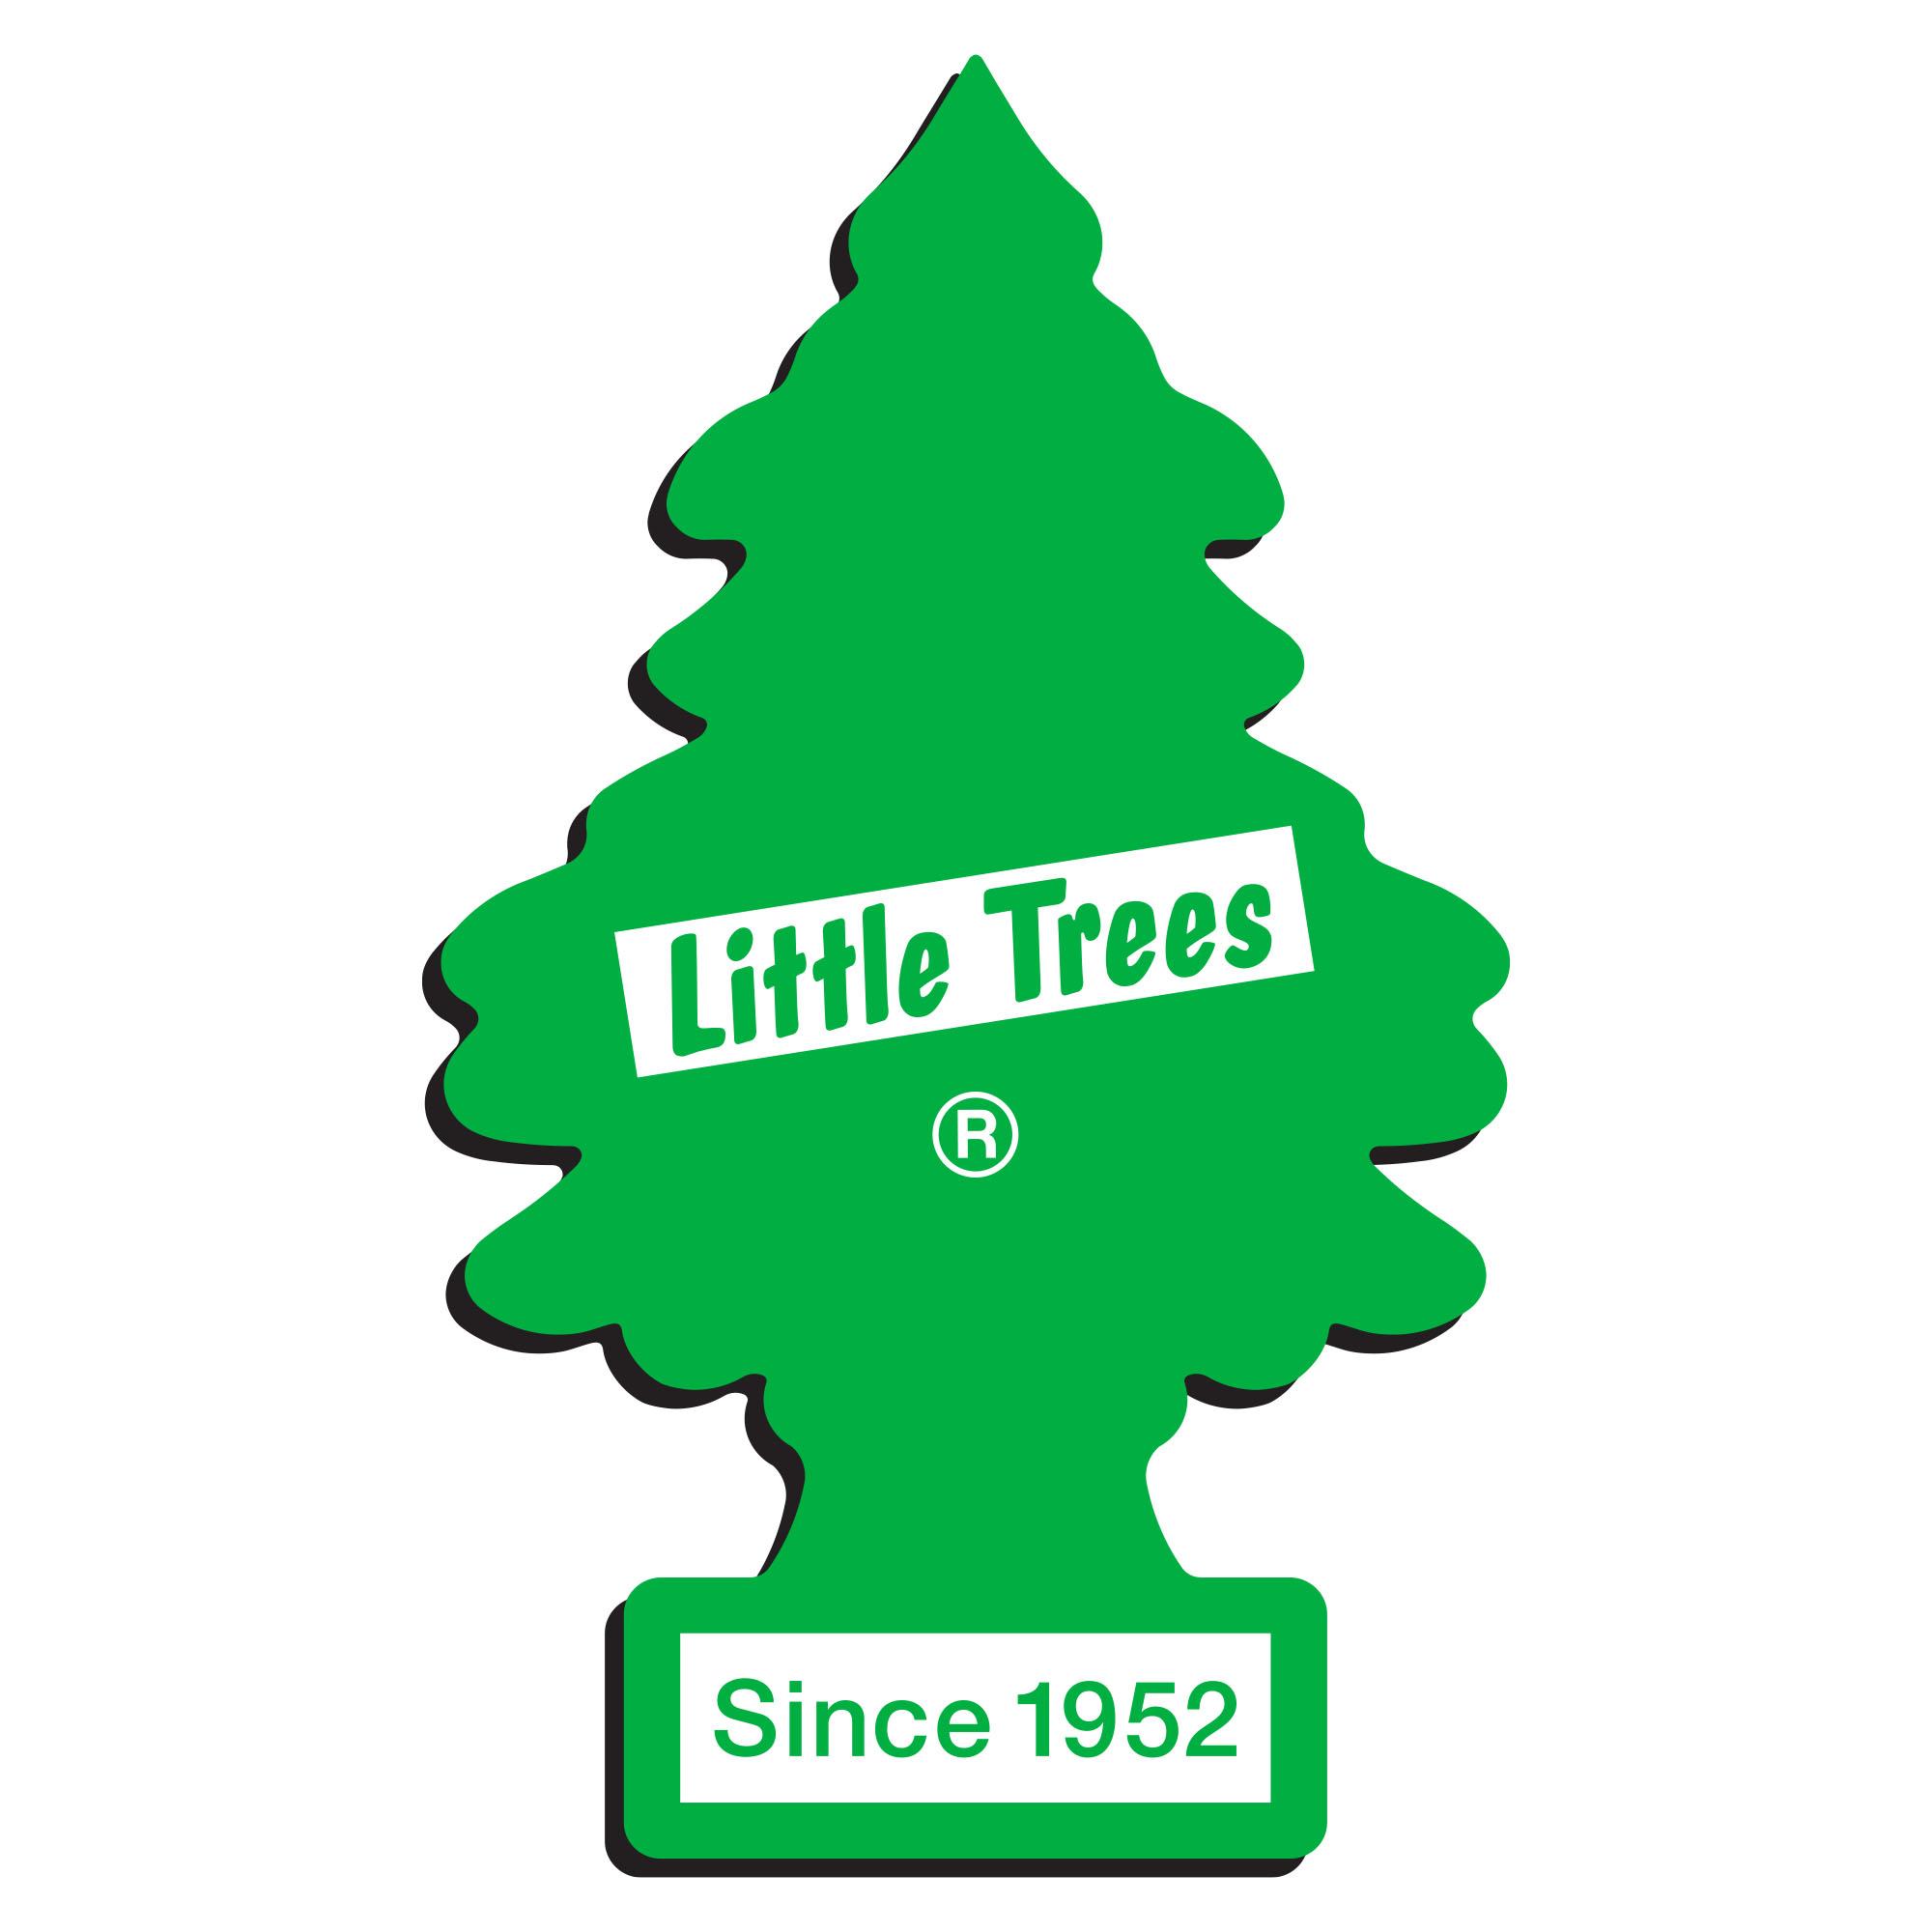 Little Trees Air Freshener New Car Scent Fragrance 3 Pack Walmart Com Walmart Com